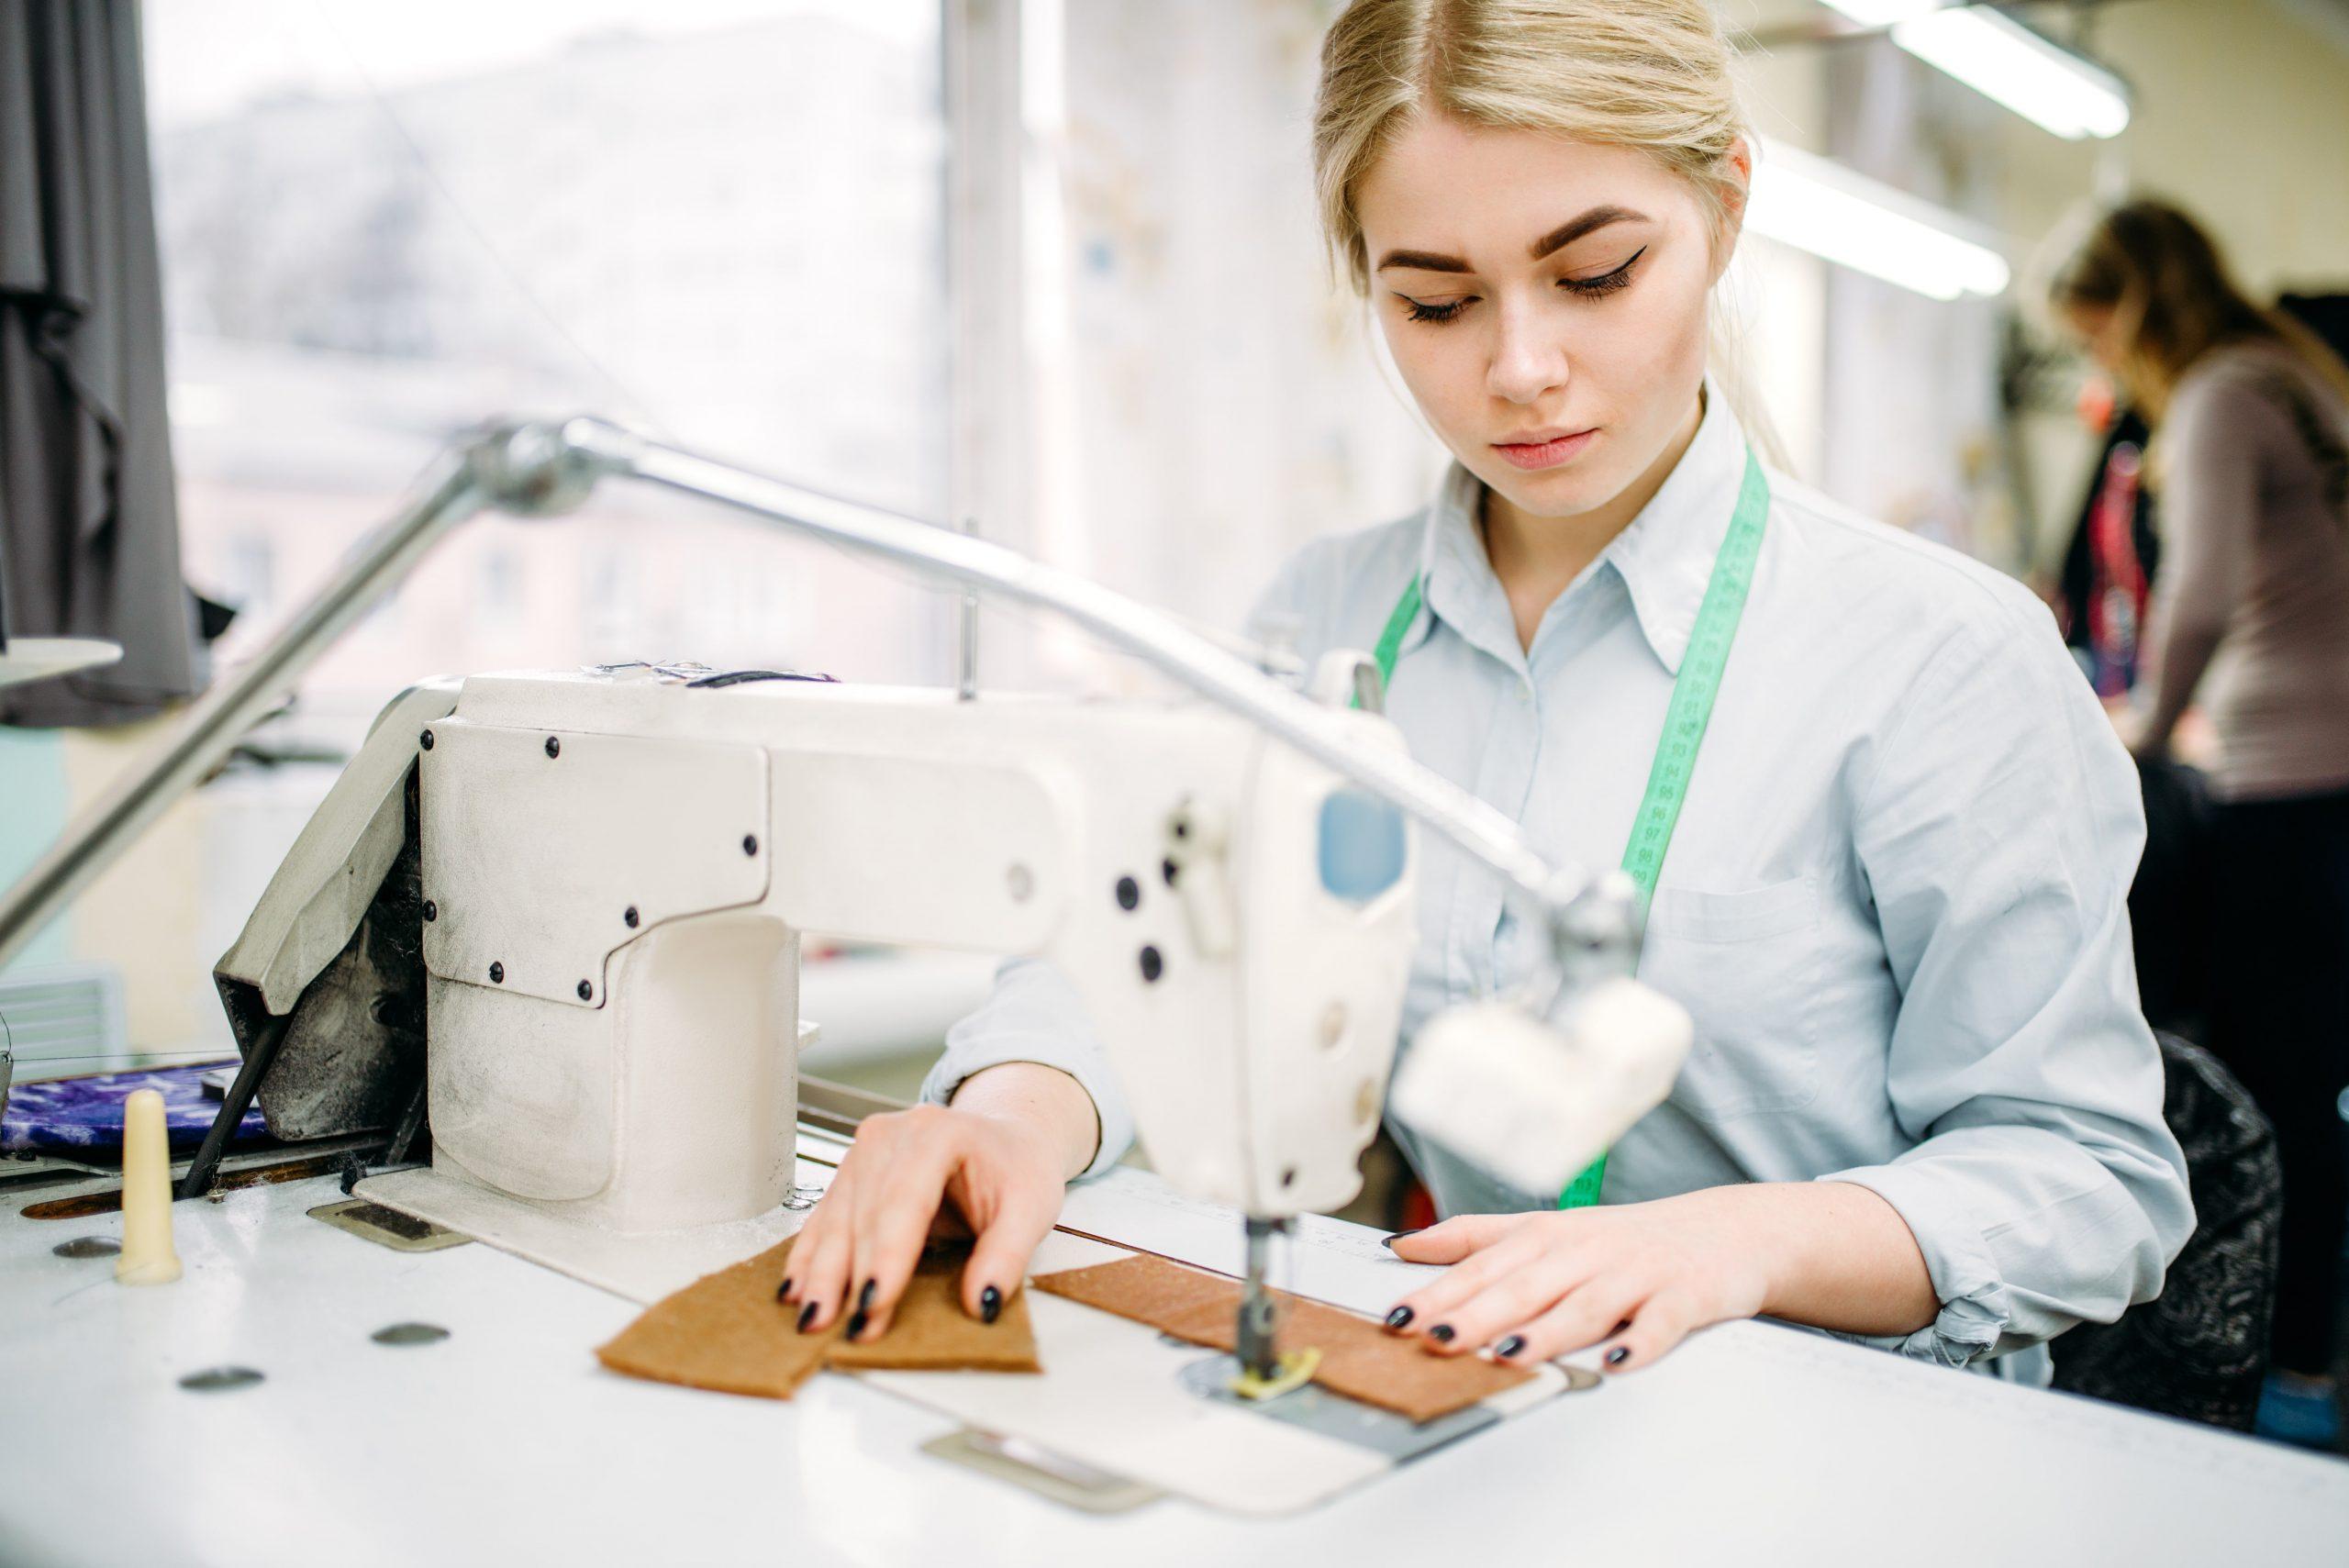 needlewoman-sews-fabrics-on-a-sewing-machine-PBPZL63-min